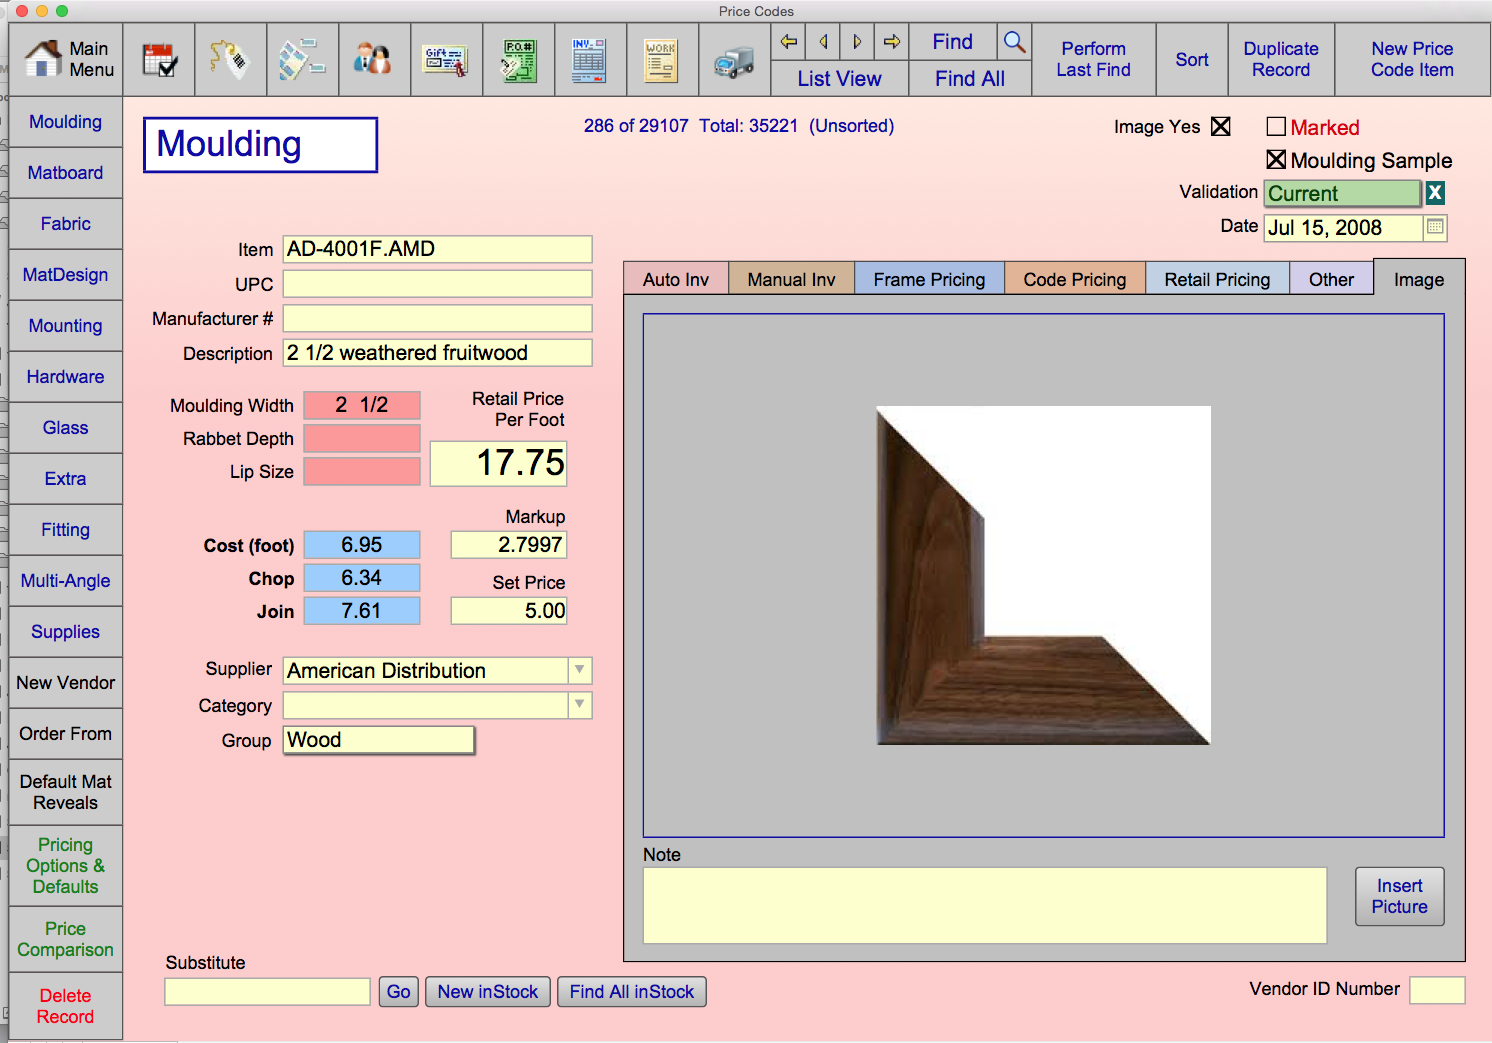 PC image tab